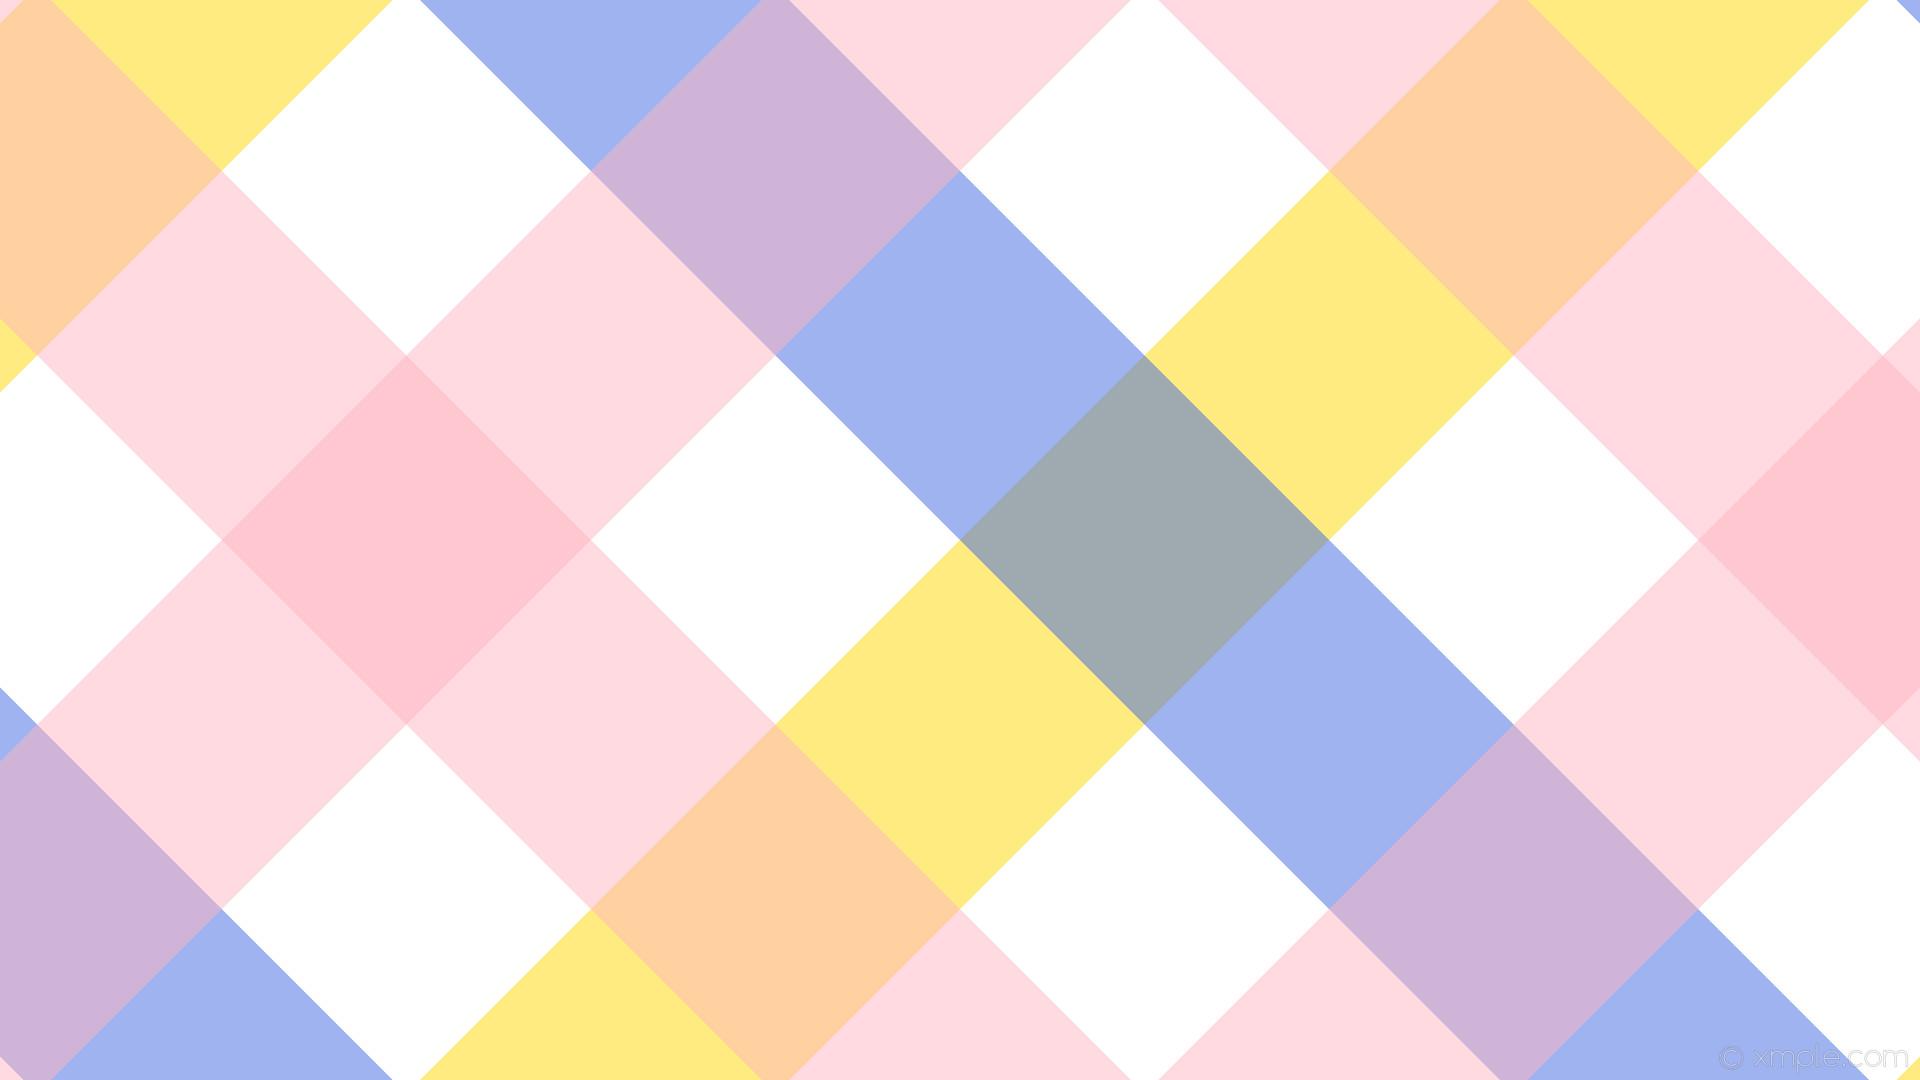 wallpaper pink quad white yellow blue gingham striped gold royal blue light  pink #ffffff #